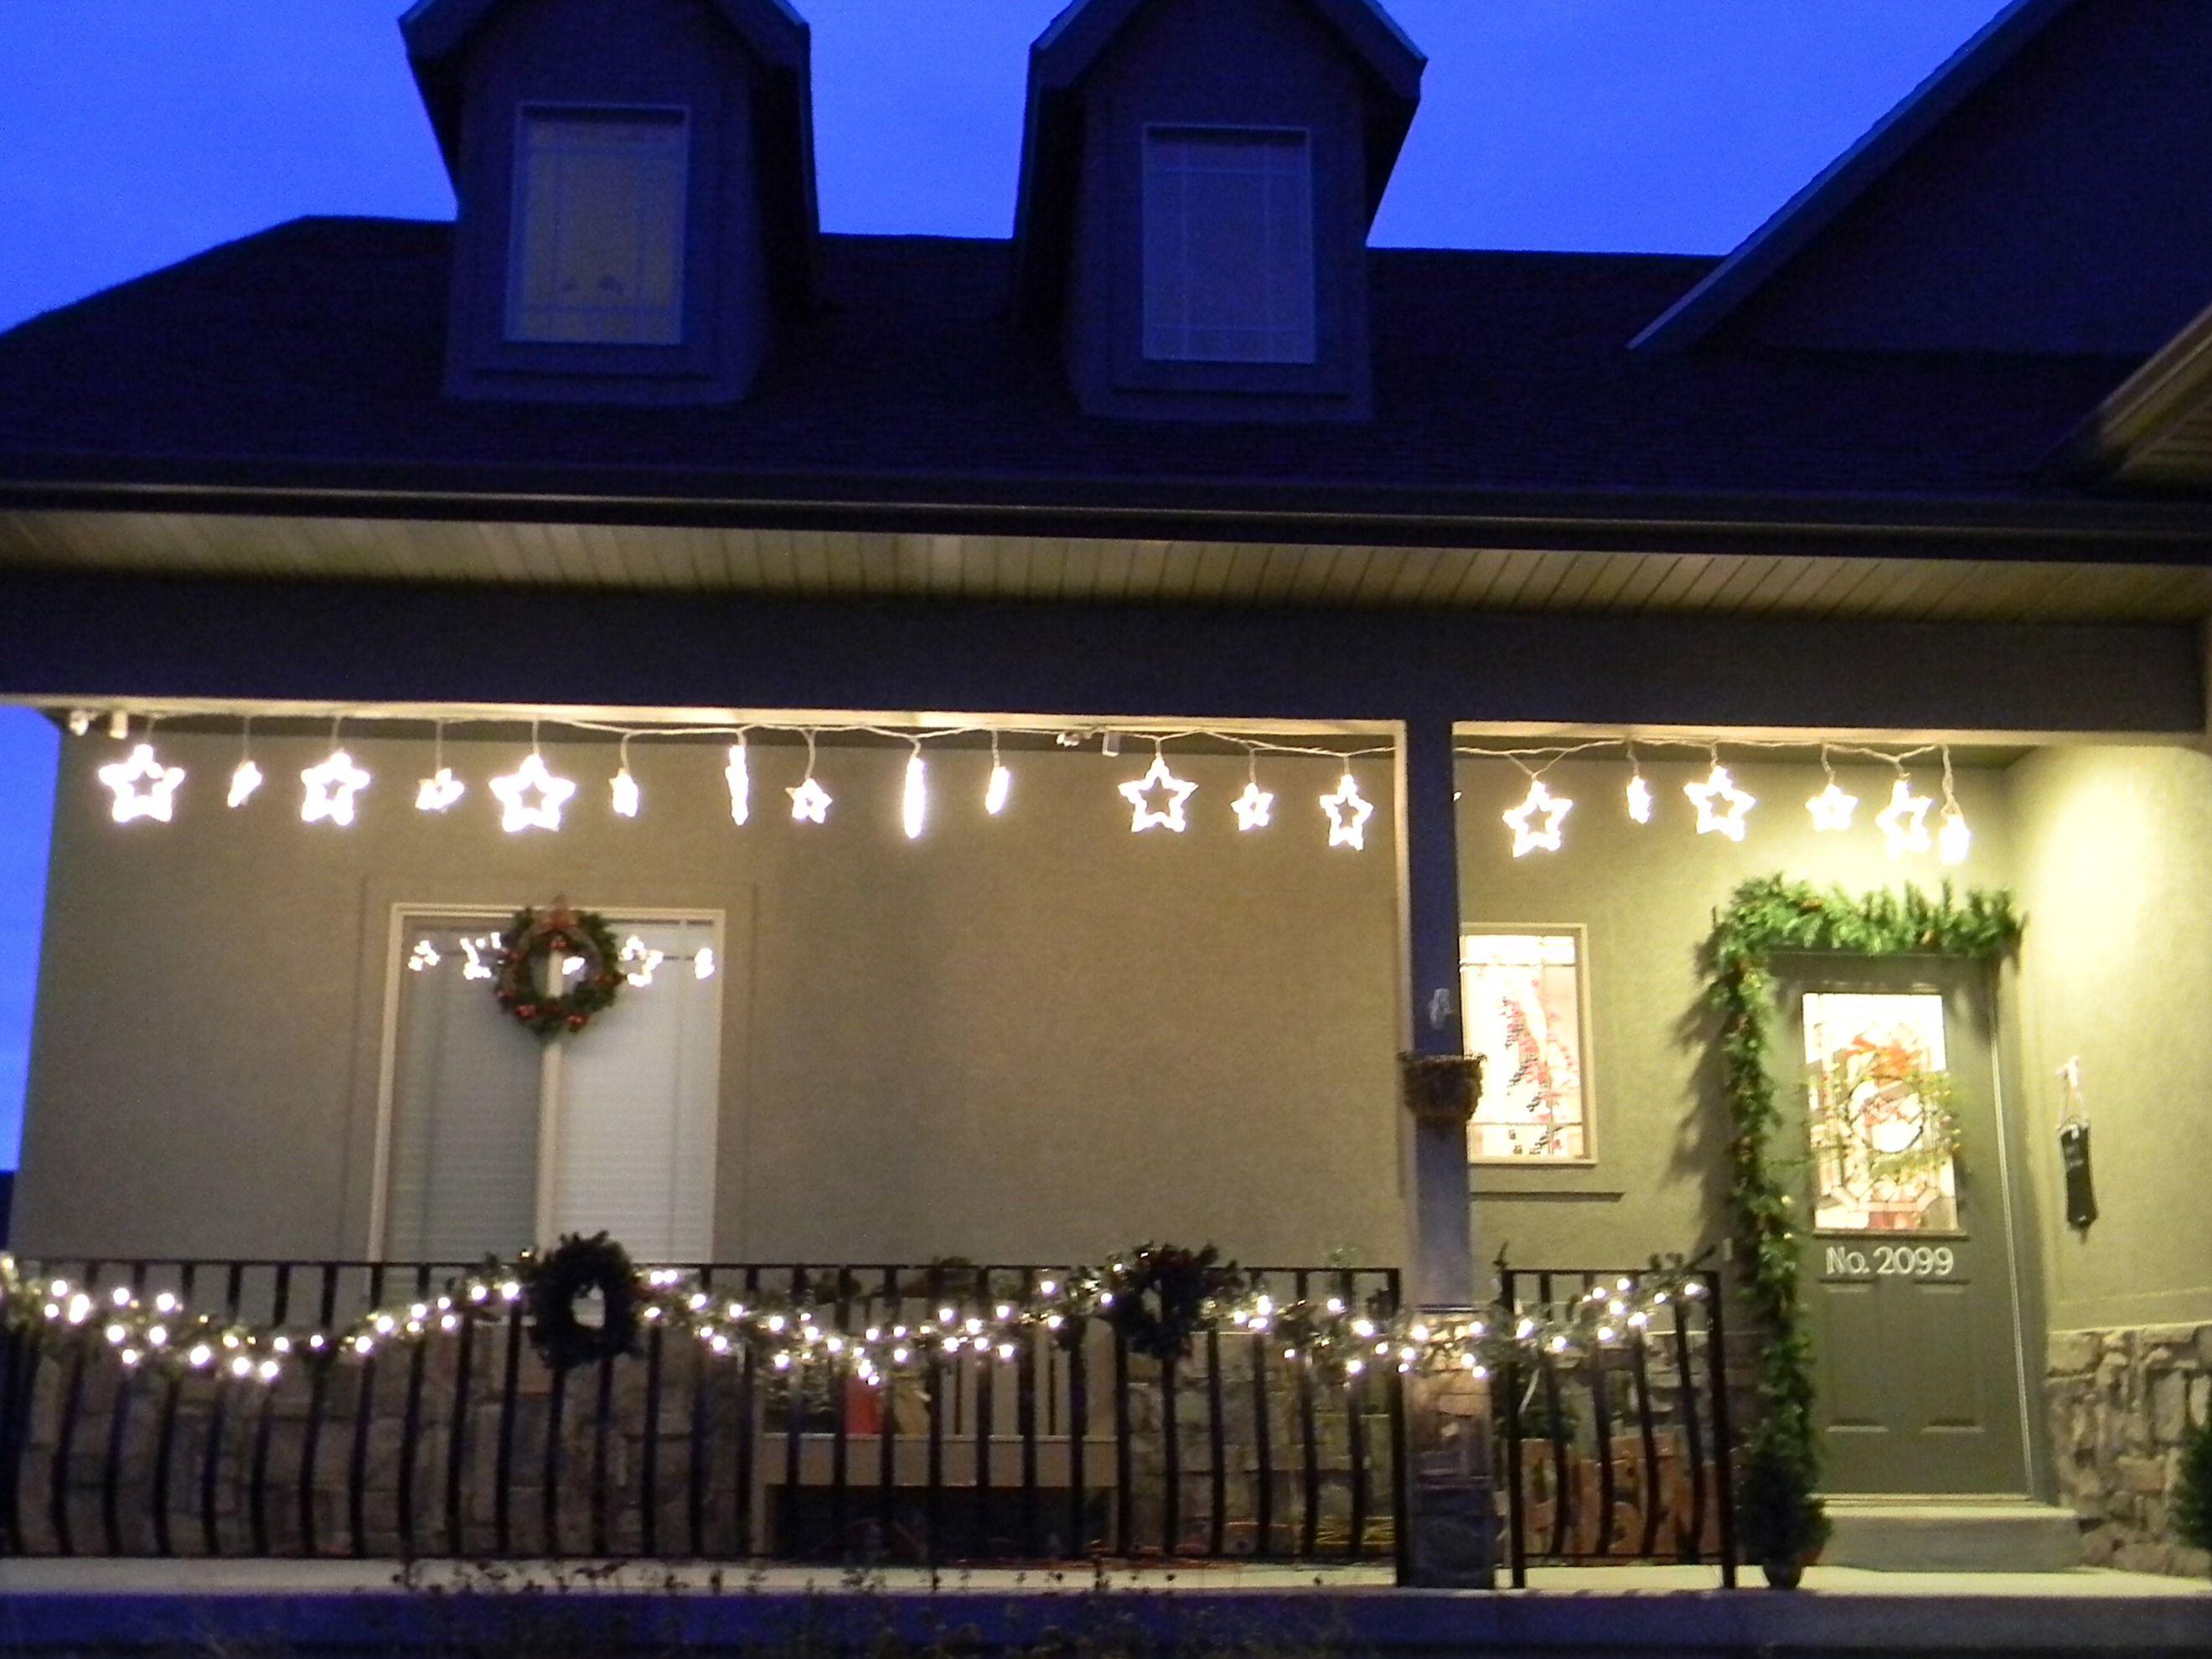 Porch Christmas Decorating Ideas sparkling christmas garland lights decoration ideas | interior